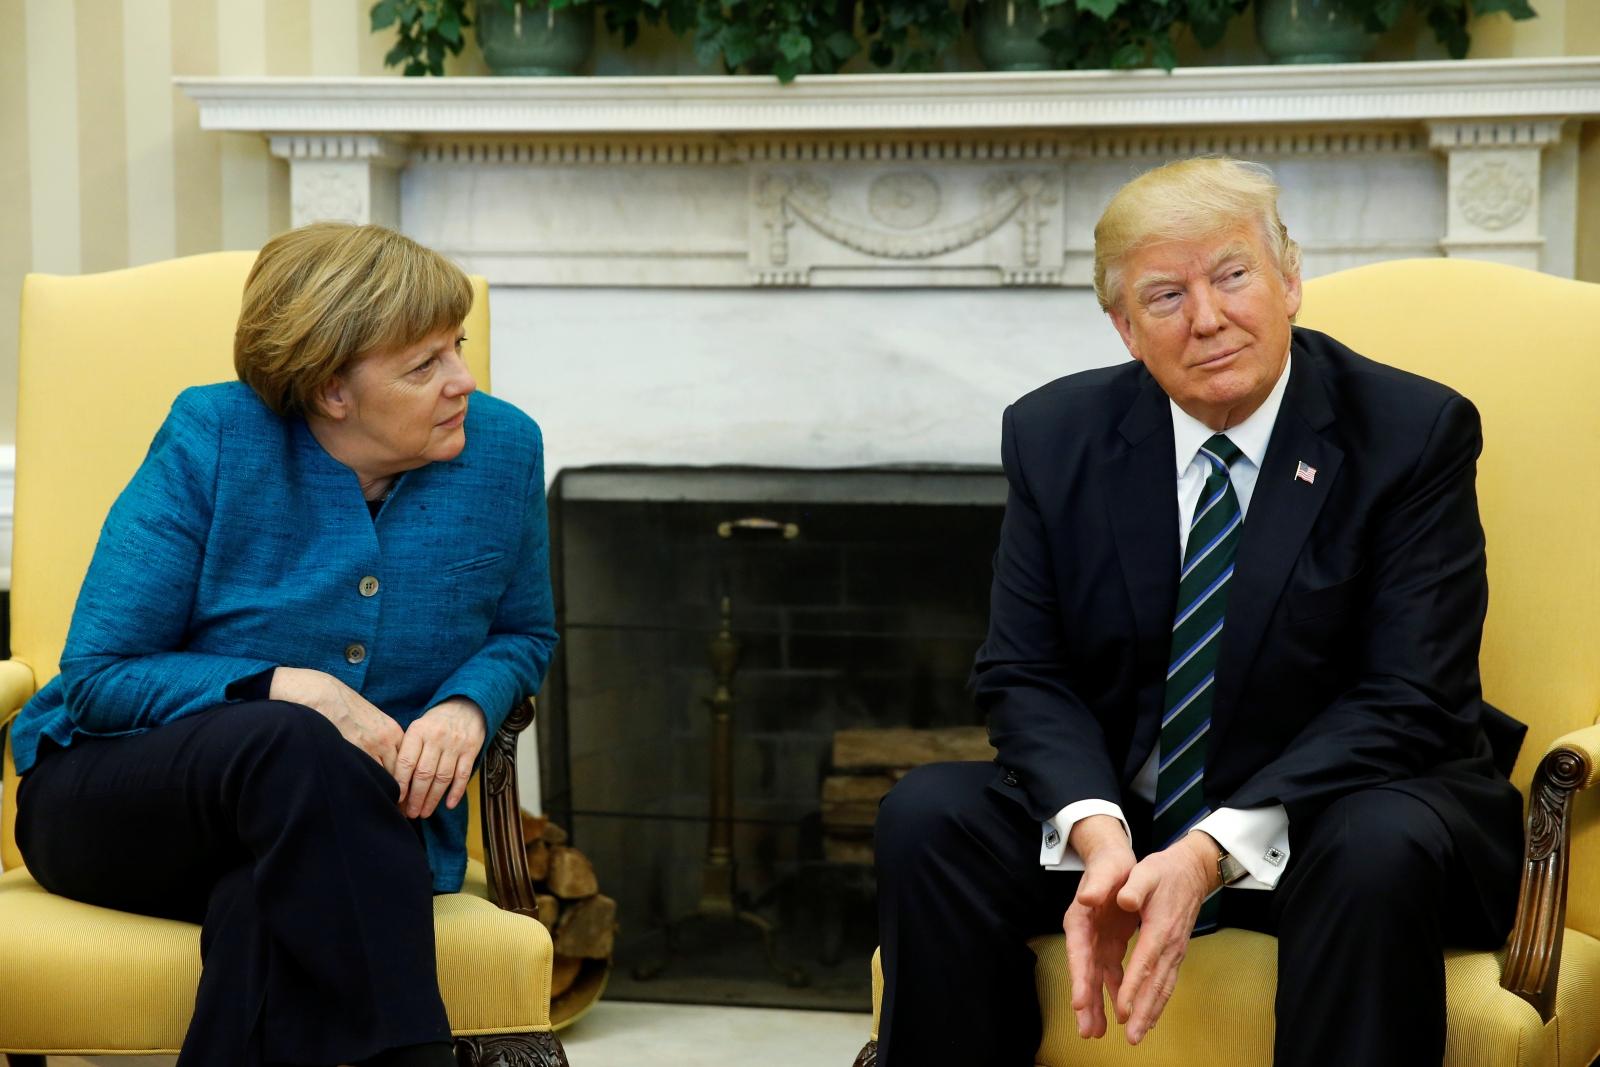 Frosty meeting between Trump and Merkel